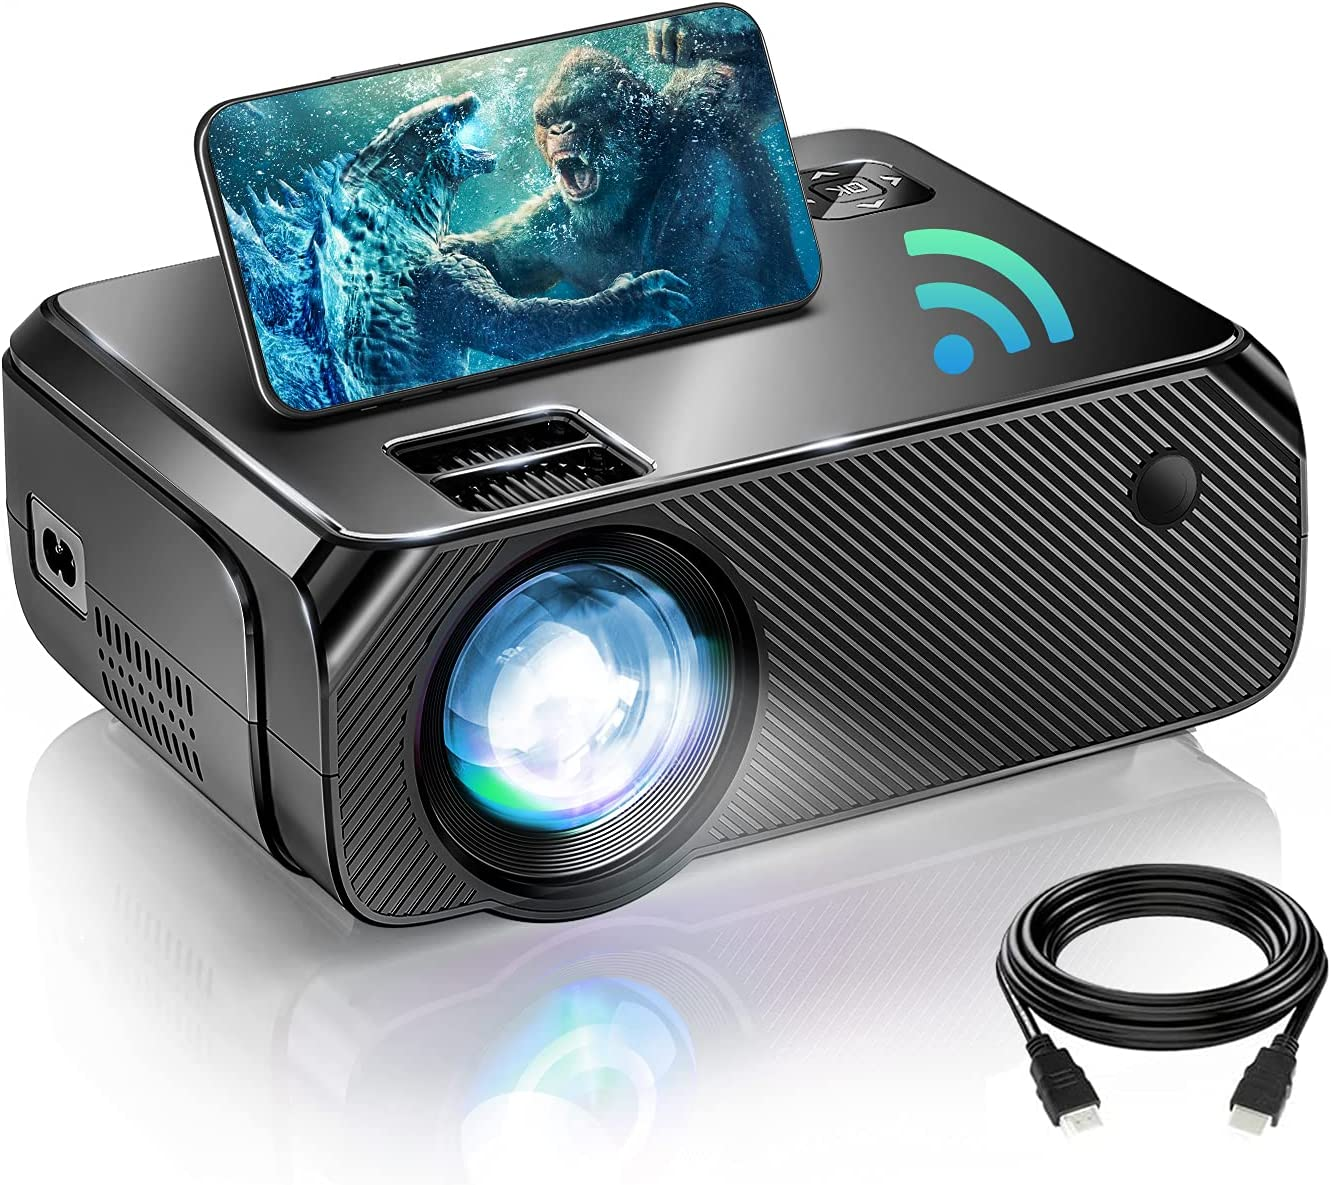 Bowmaker Tech 1080P Native WiFi Mini Projector $64.99 Coupon